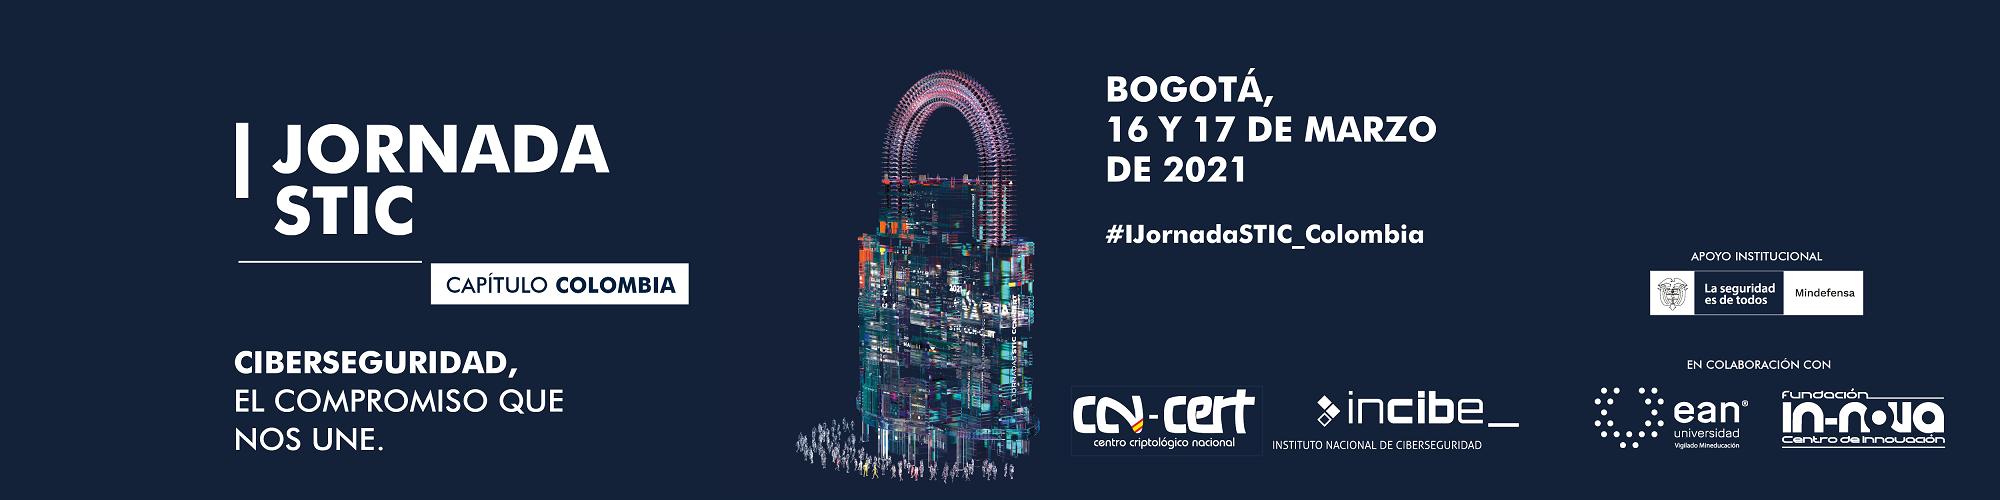 1-ijornadas_Colombia_banner-general-ene2021-ES-INCIBE-4